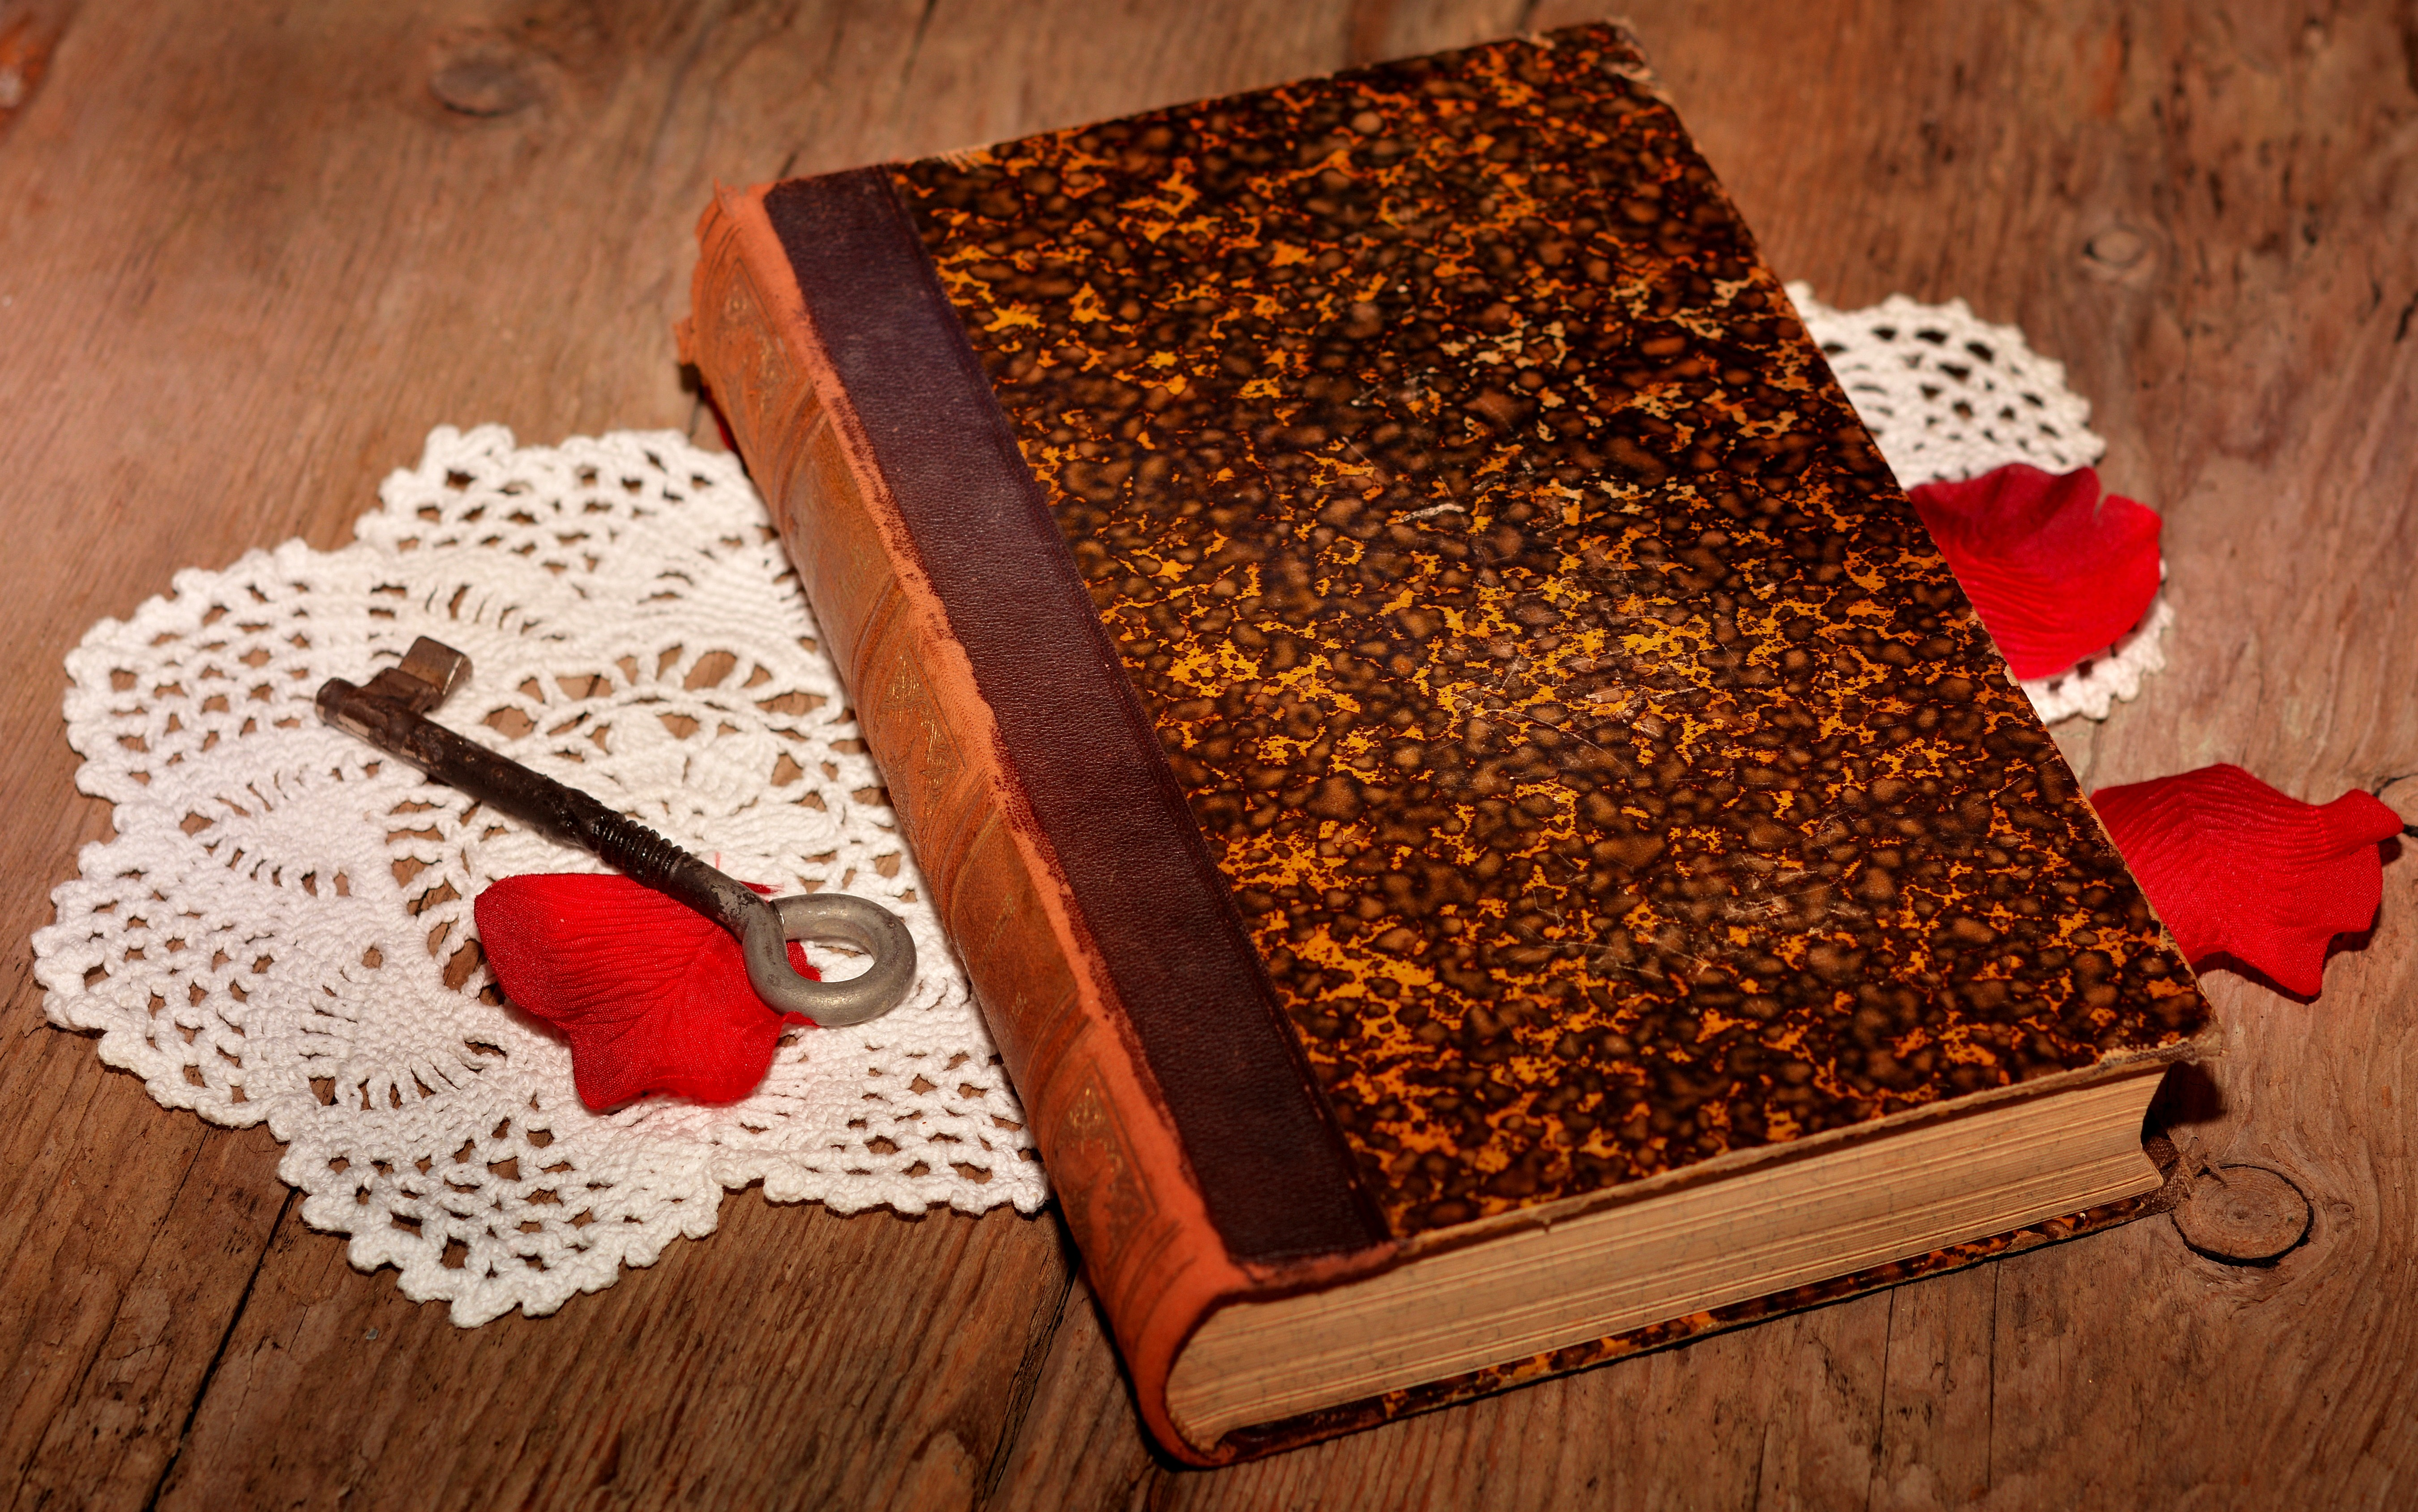 Book, Antique, Key, Old, Paper, HQ Photo